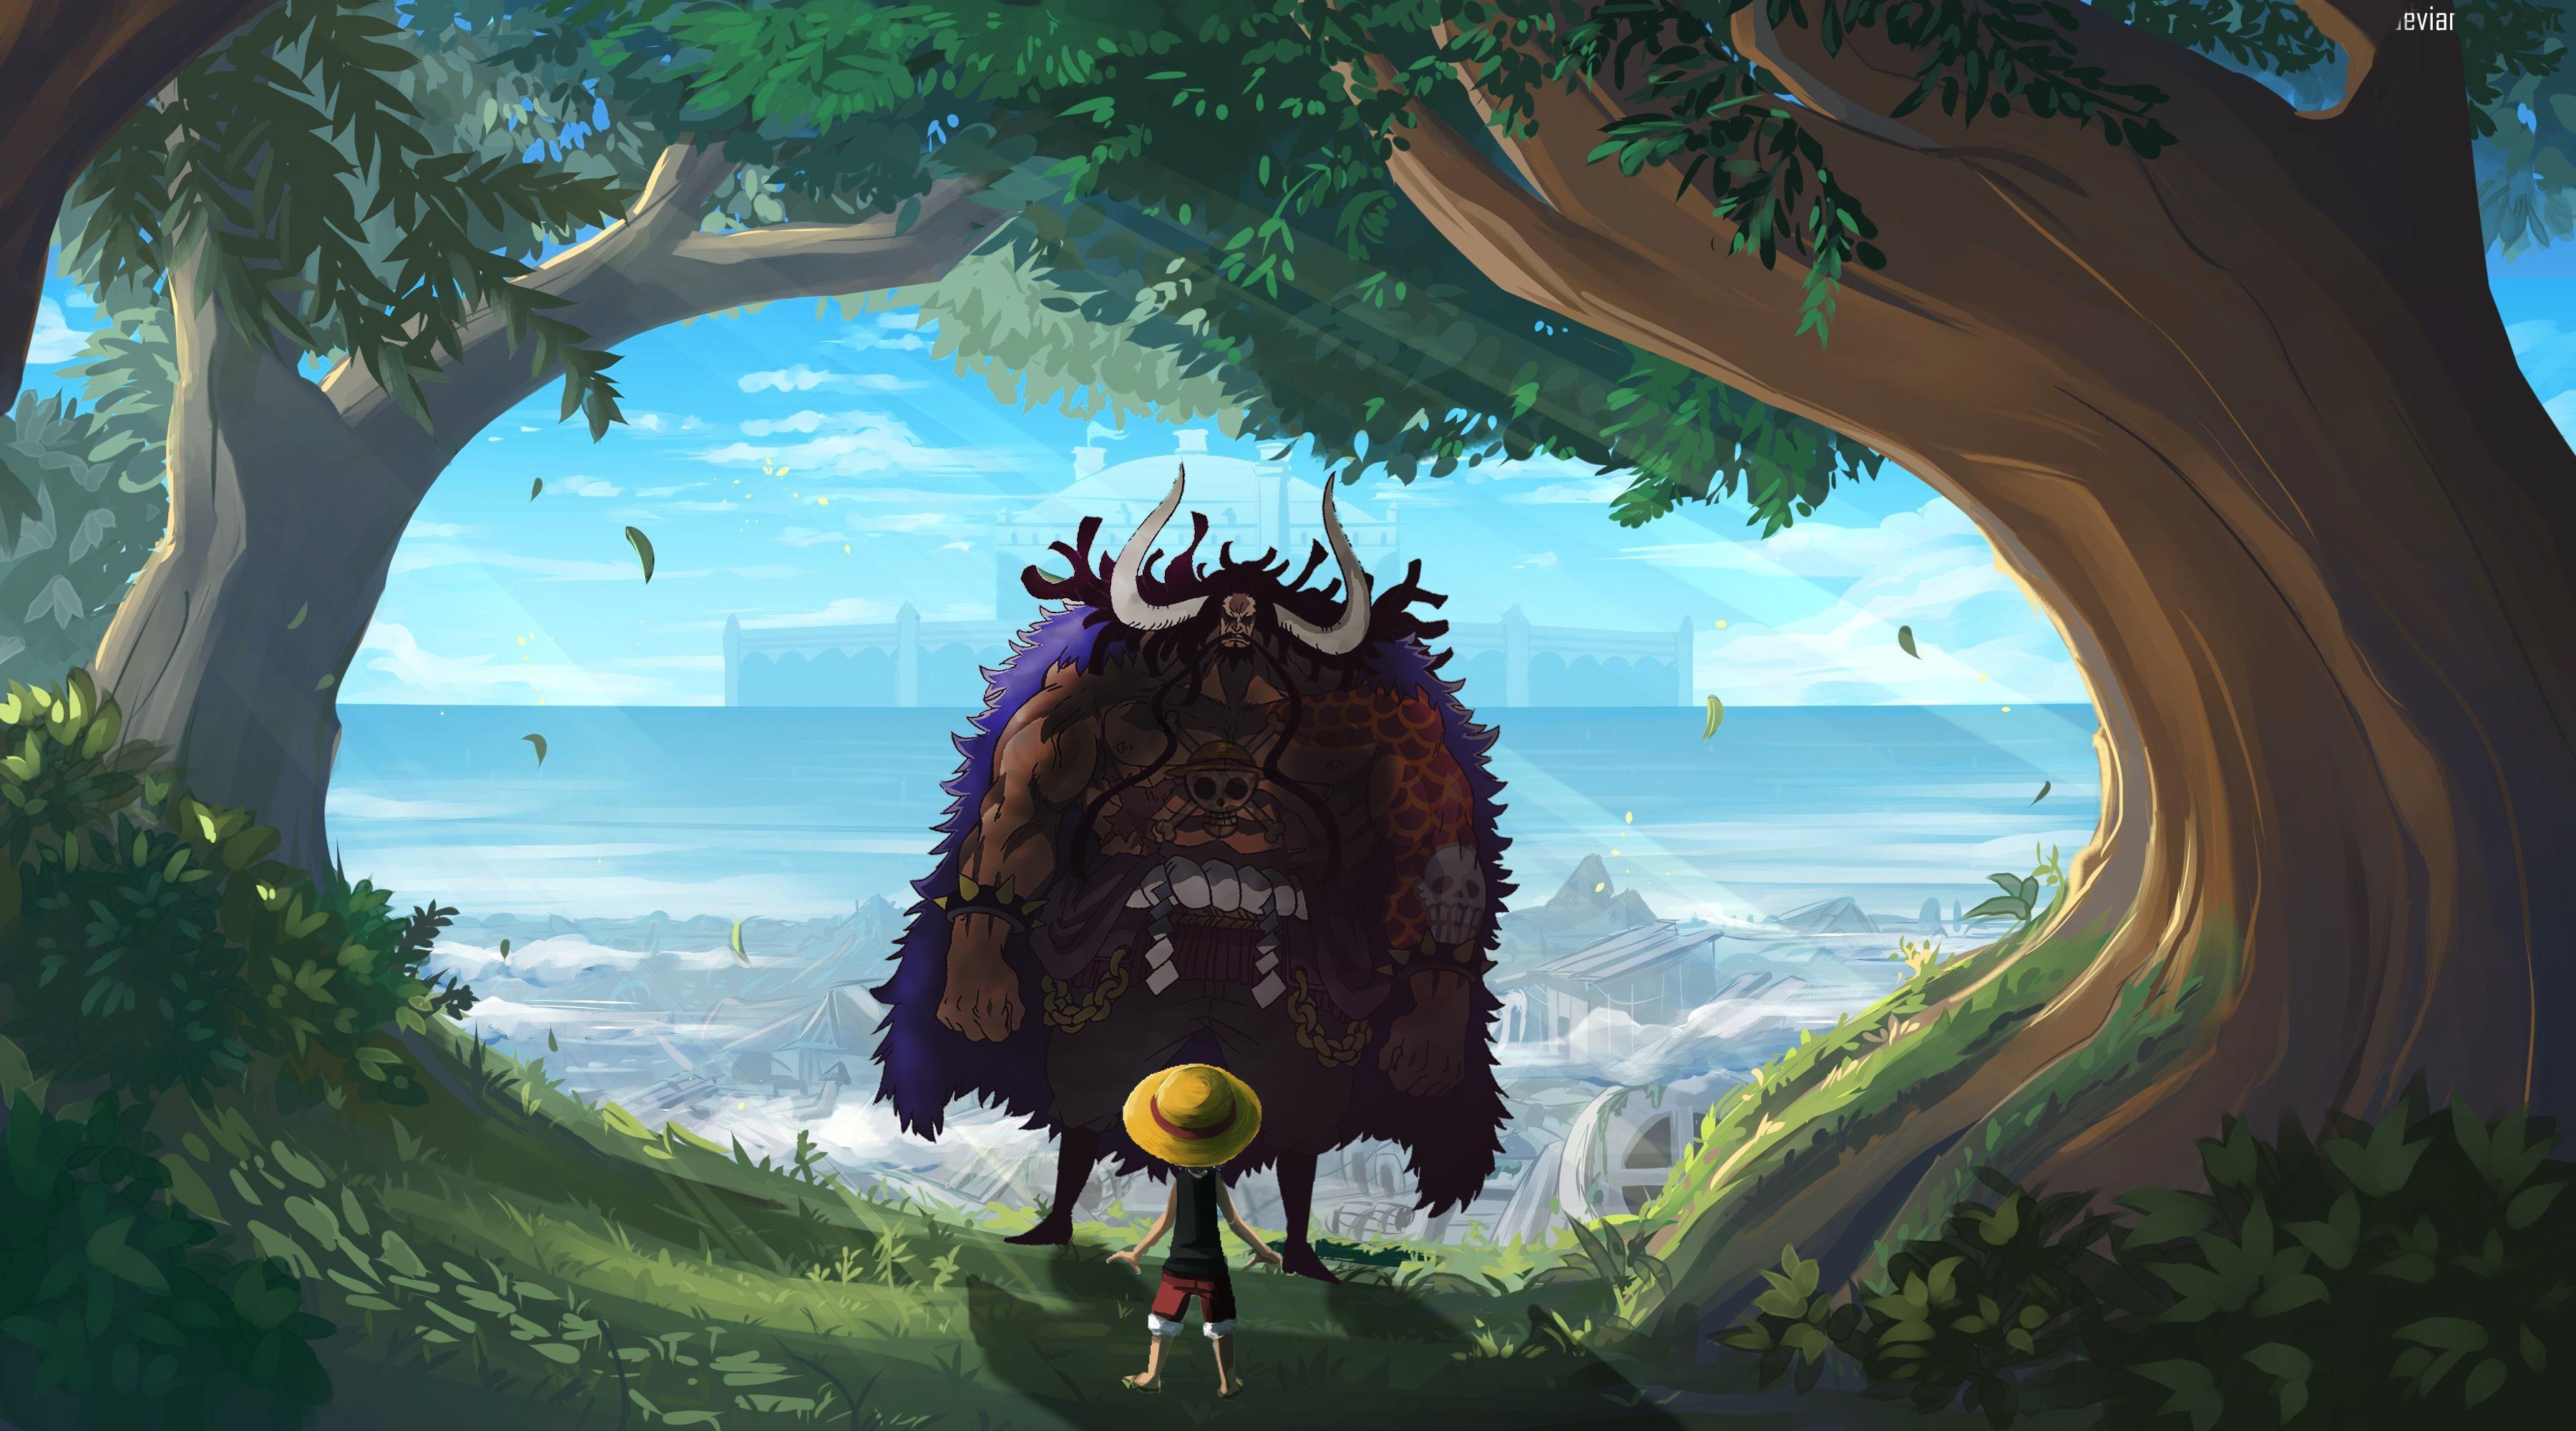 Via mangaku monkey d luffy menahan serangan dari kaido di manga one. Luffy Vs Kaido Wallpapers Top Free Luffy Vs Kaido Backgrounds Wallpaperaccess